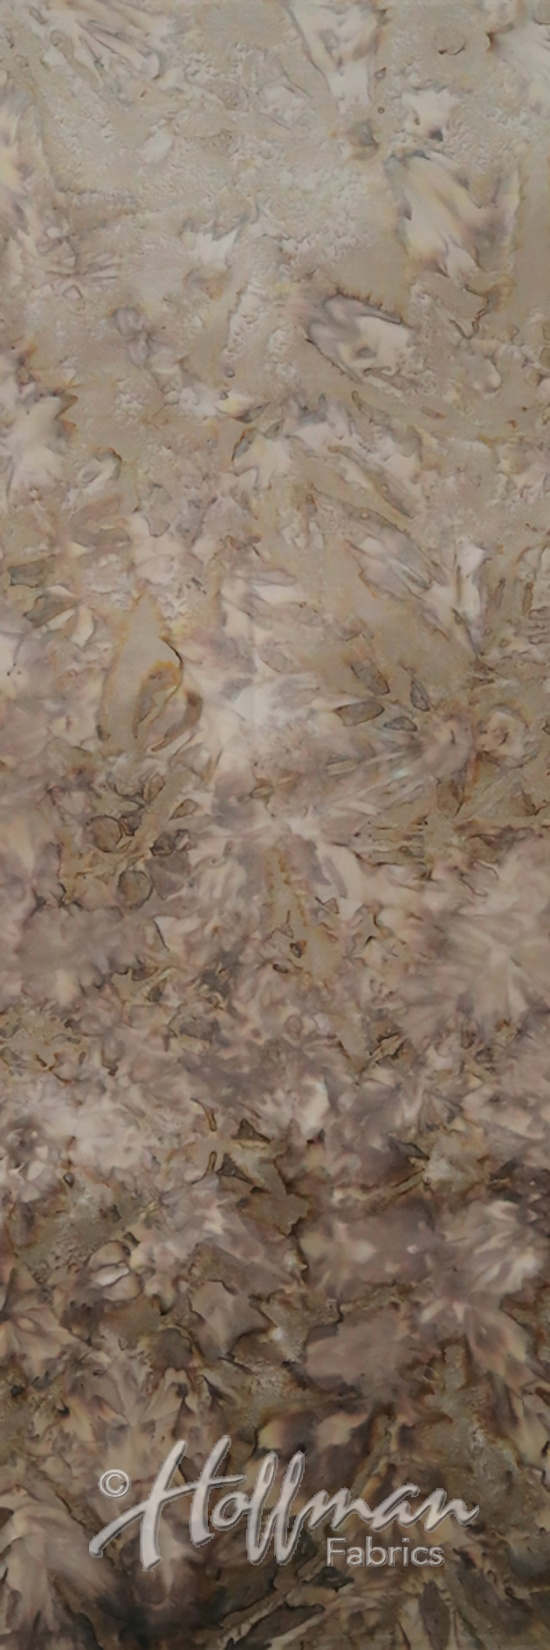 851-305-Gravel Bali Fabrics